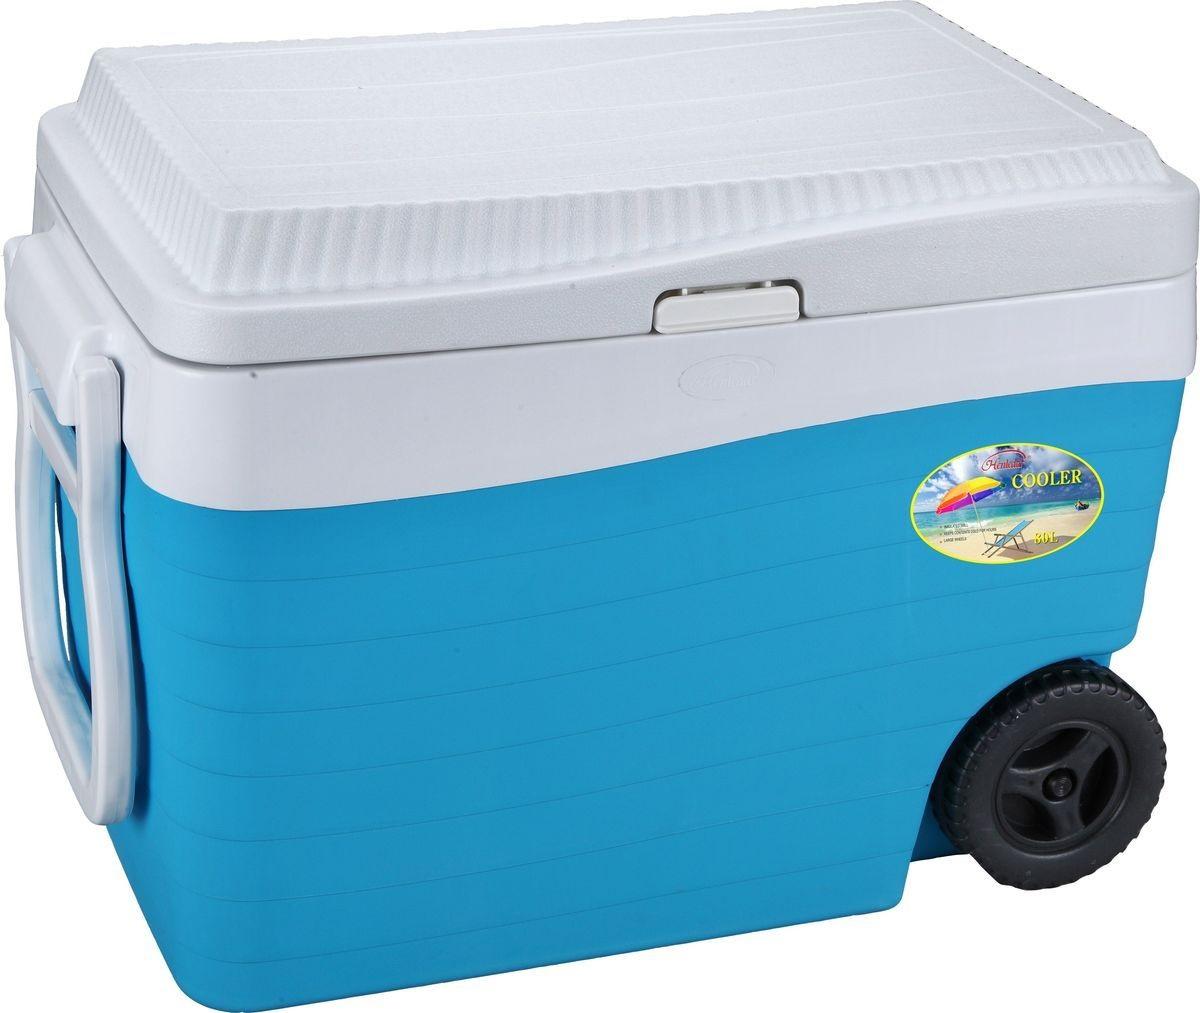 Green Glade (С22800) - контейнер изотермический, 80 л (Blue)